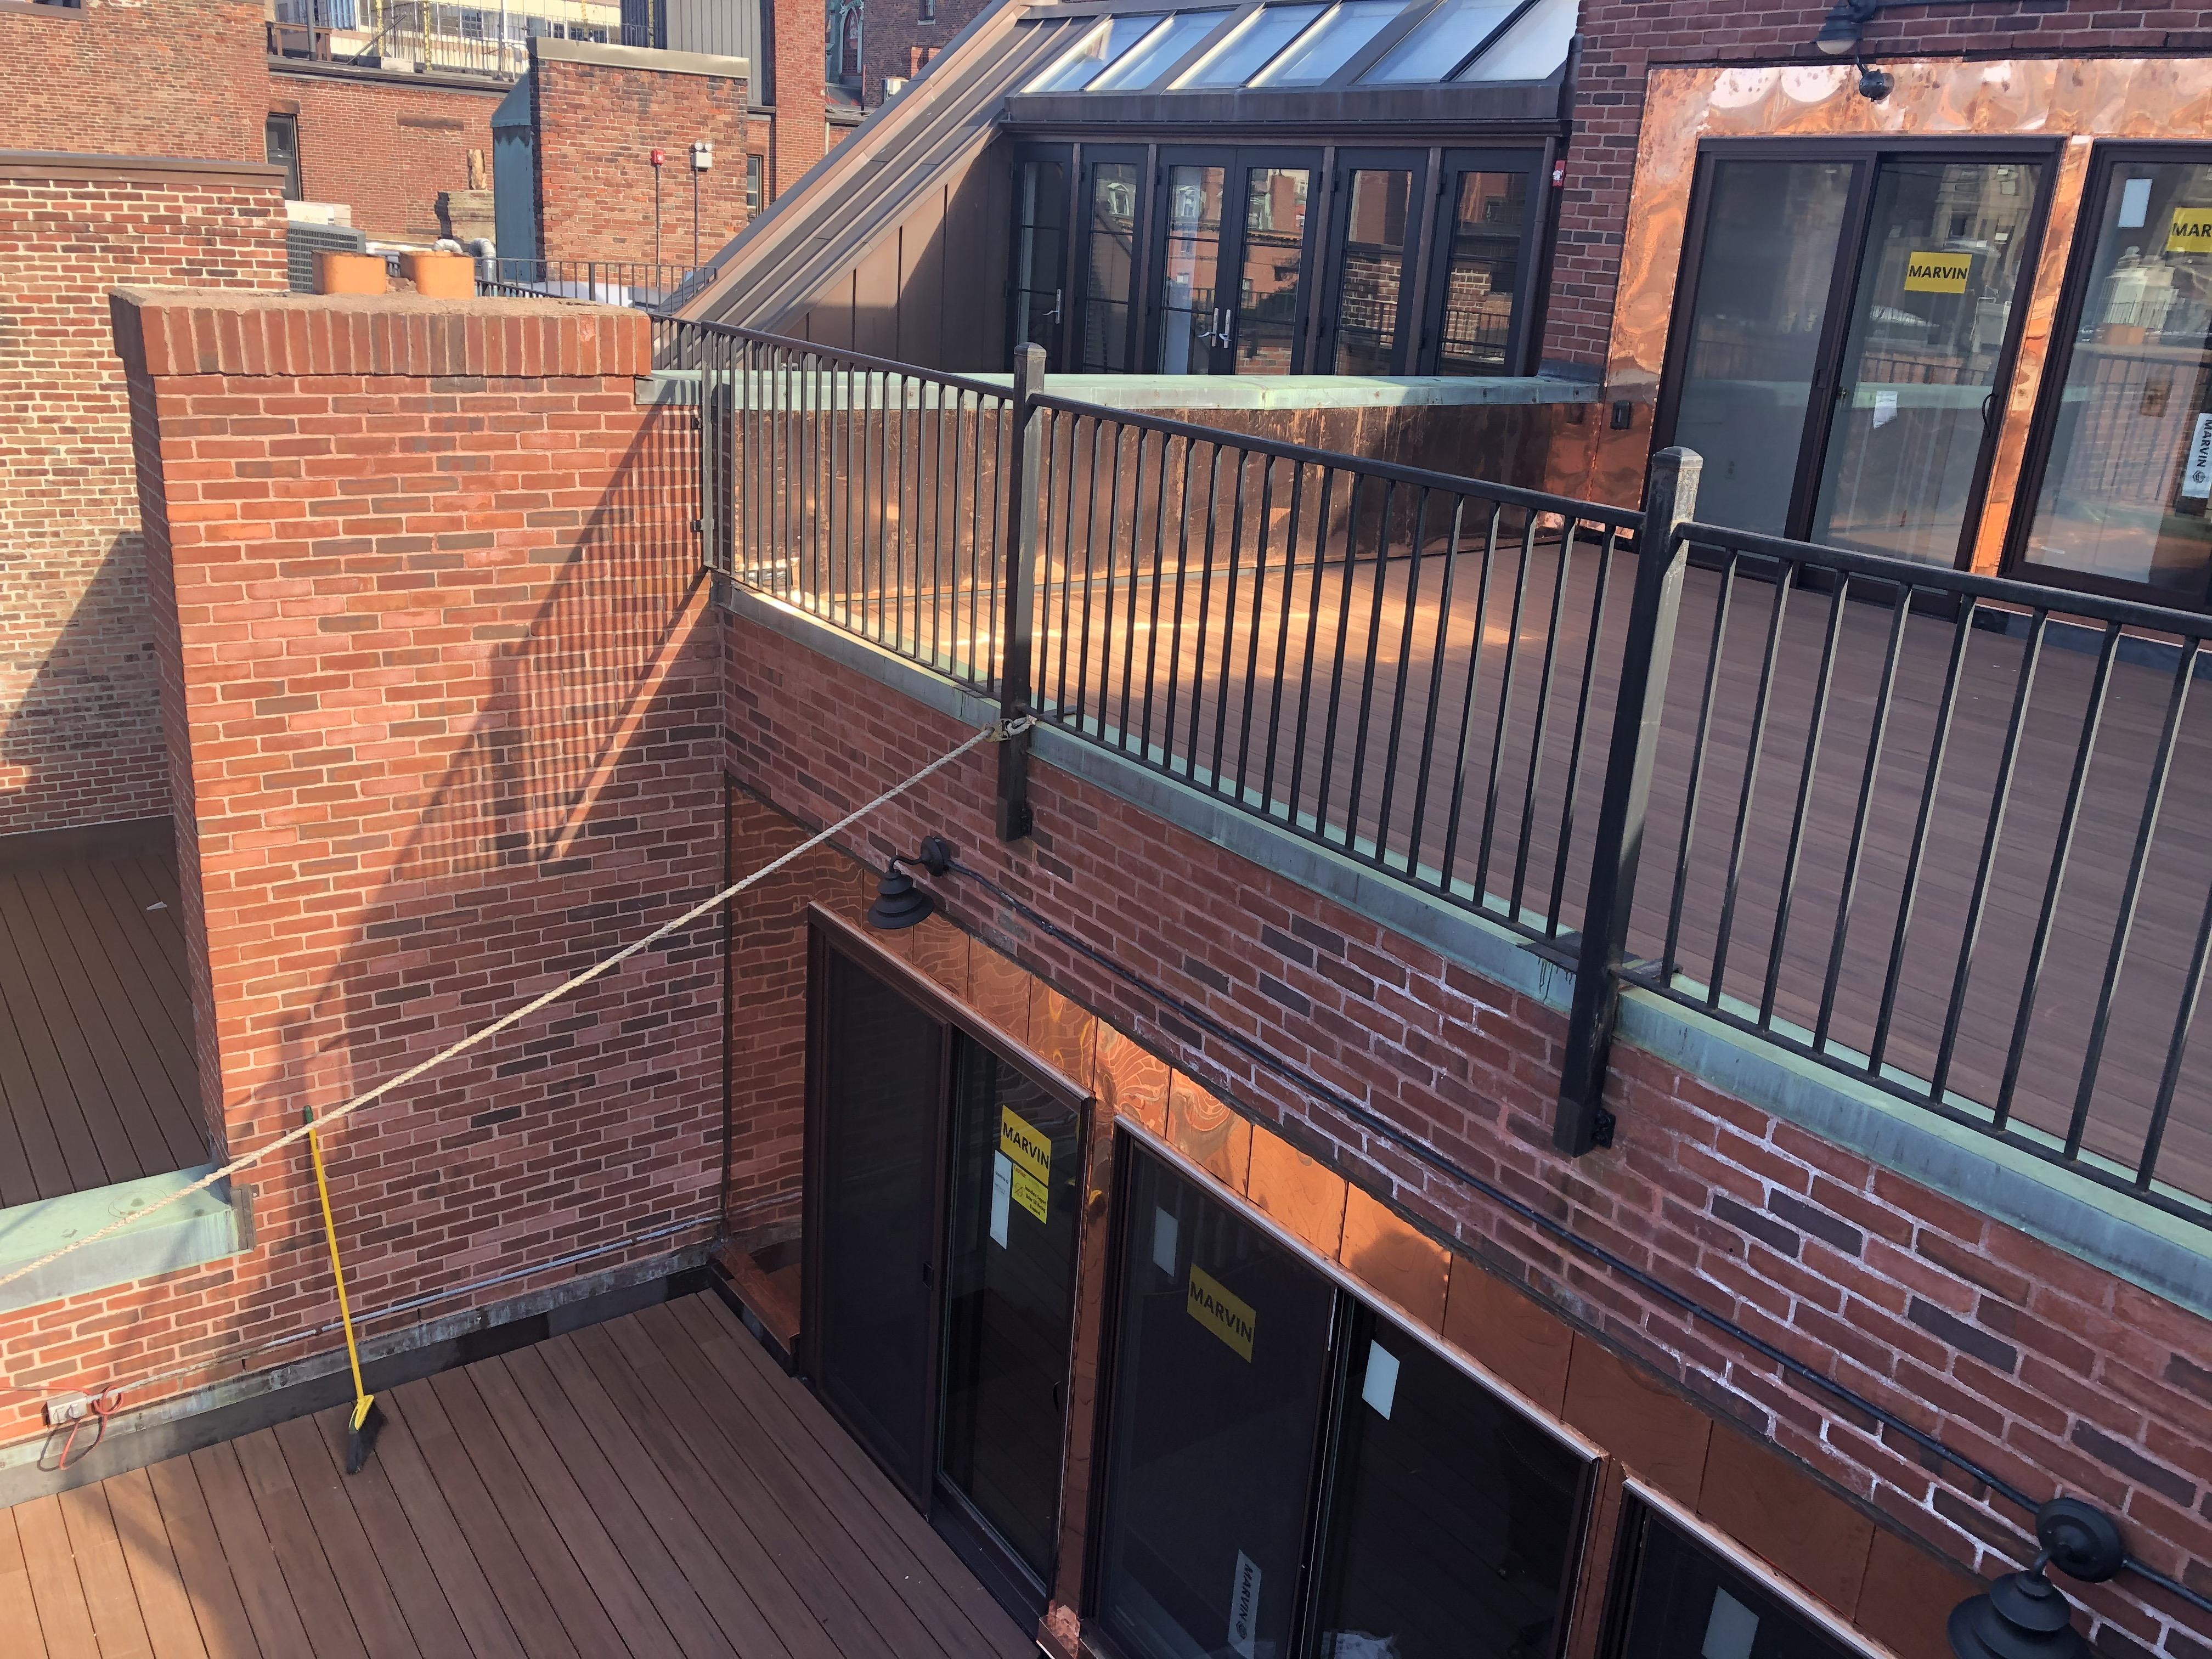 Newbury St. Roof Deck